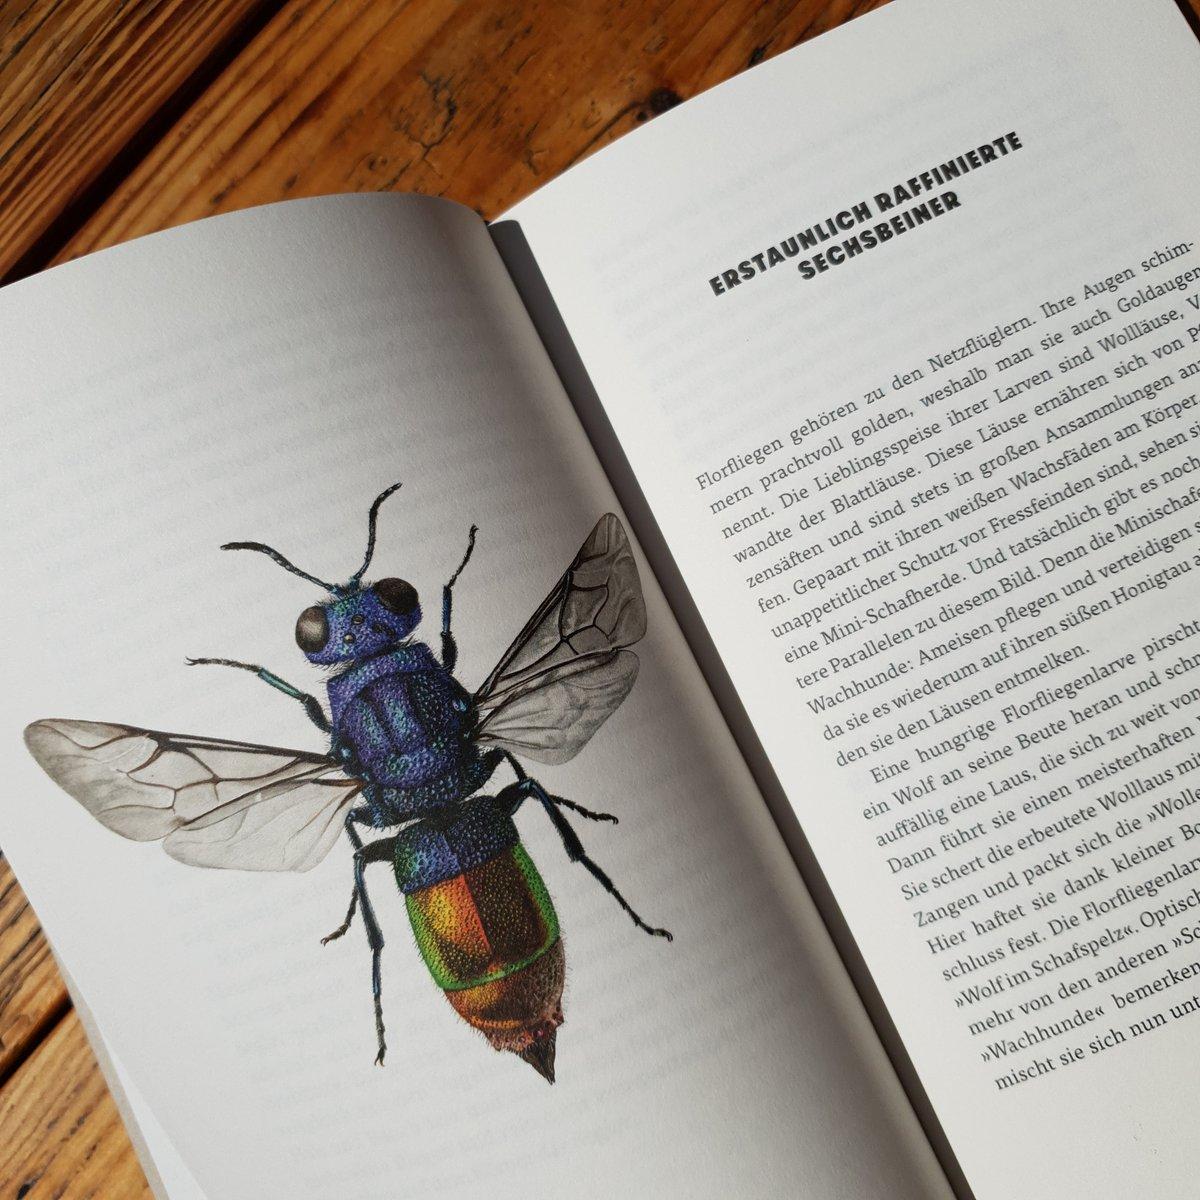 """Mikroorgasmen überall"" Buch - by Dominik Eulberg"